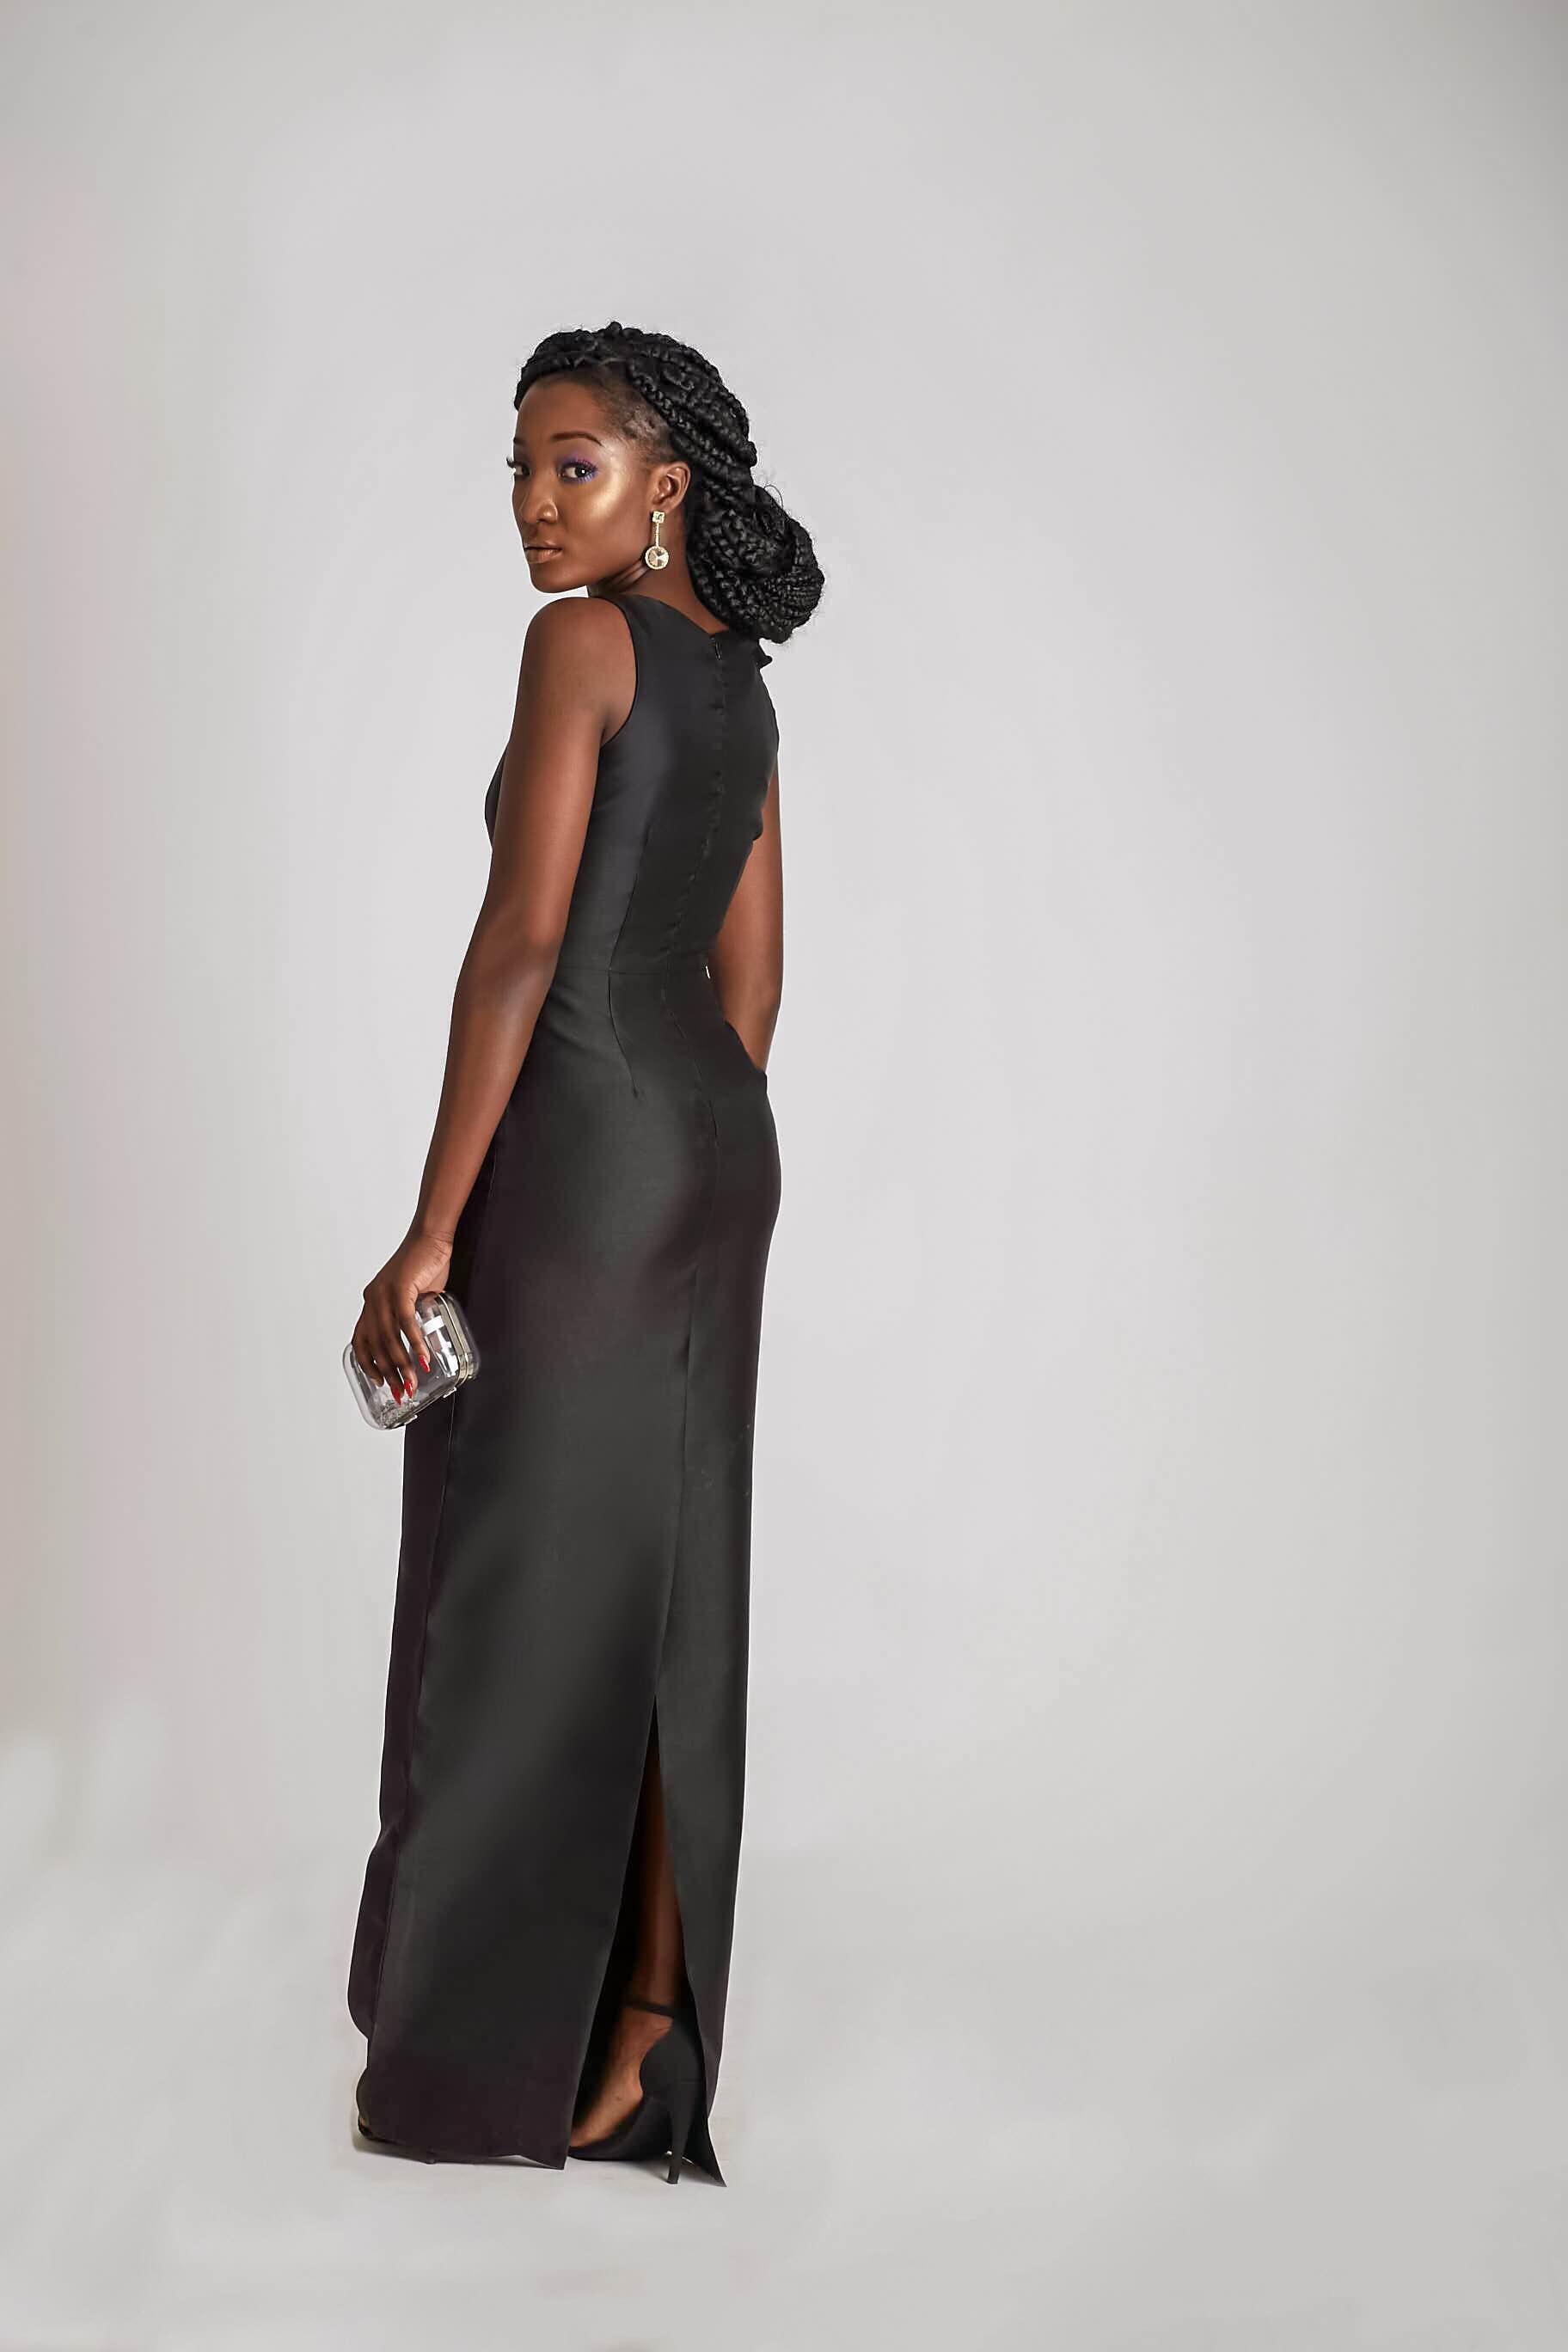 Imad Eduso - BN Style - Collection Lookbook - BellaNaija.com 019